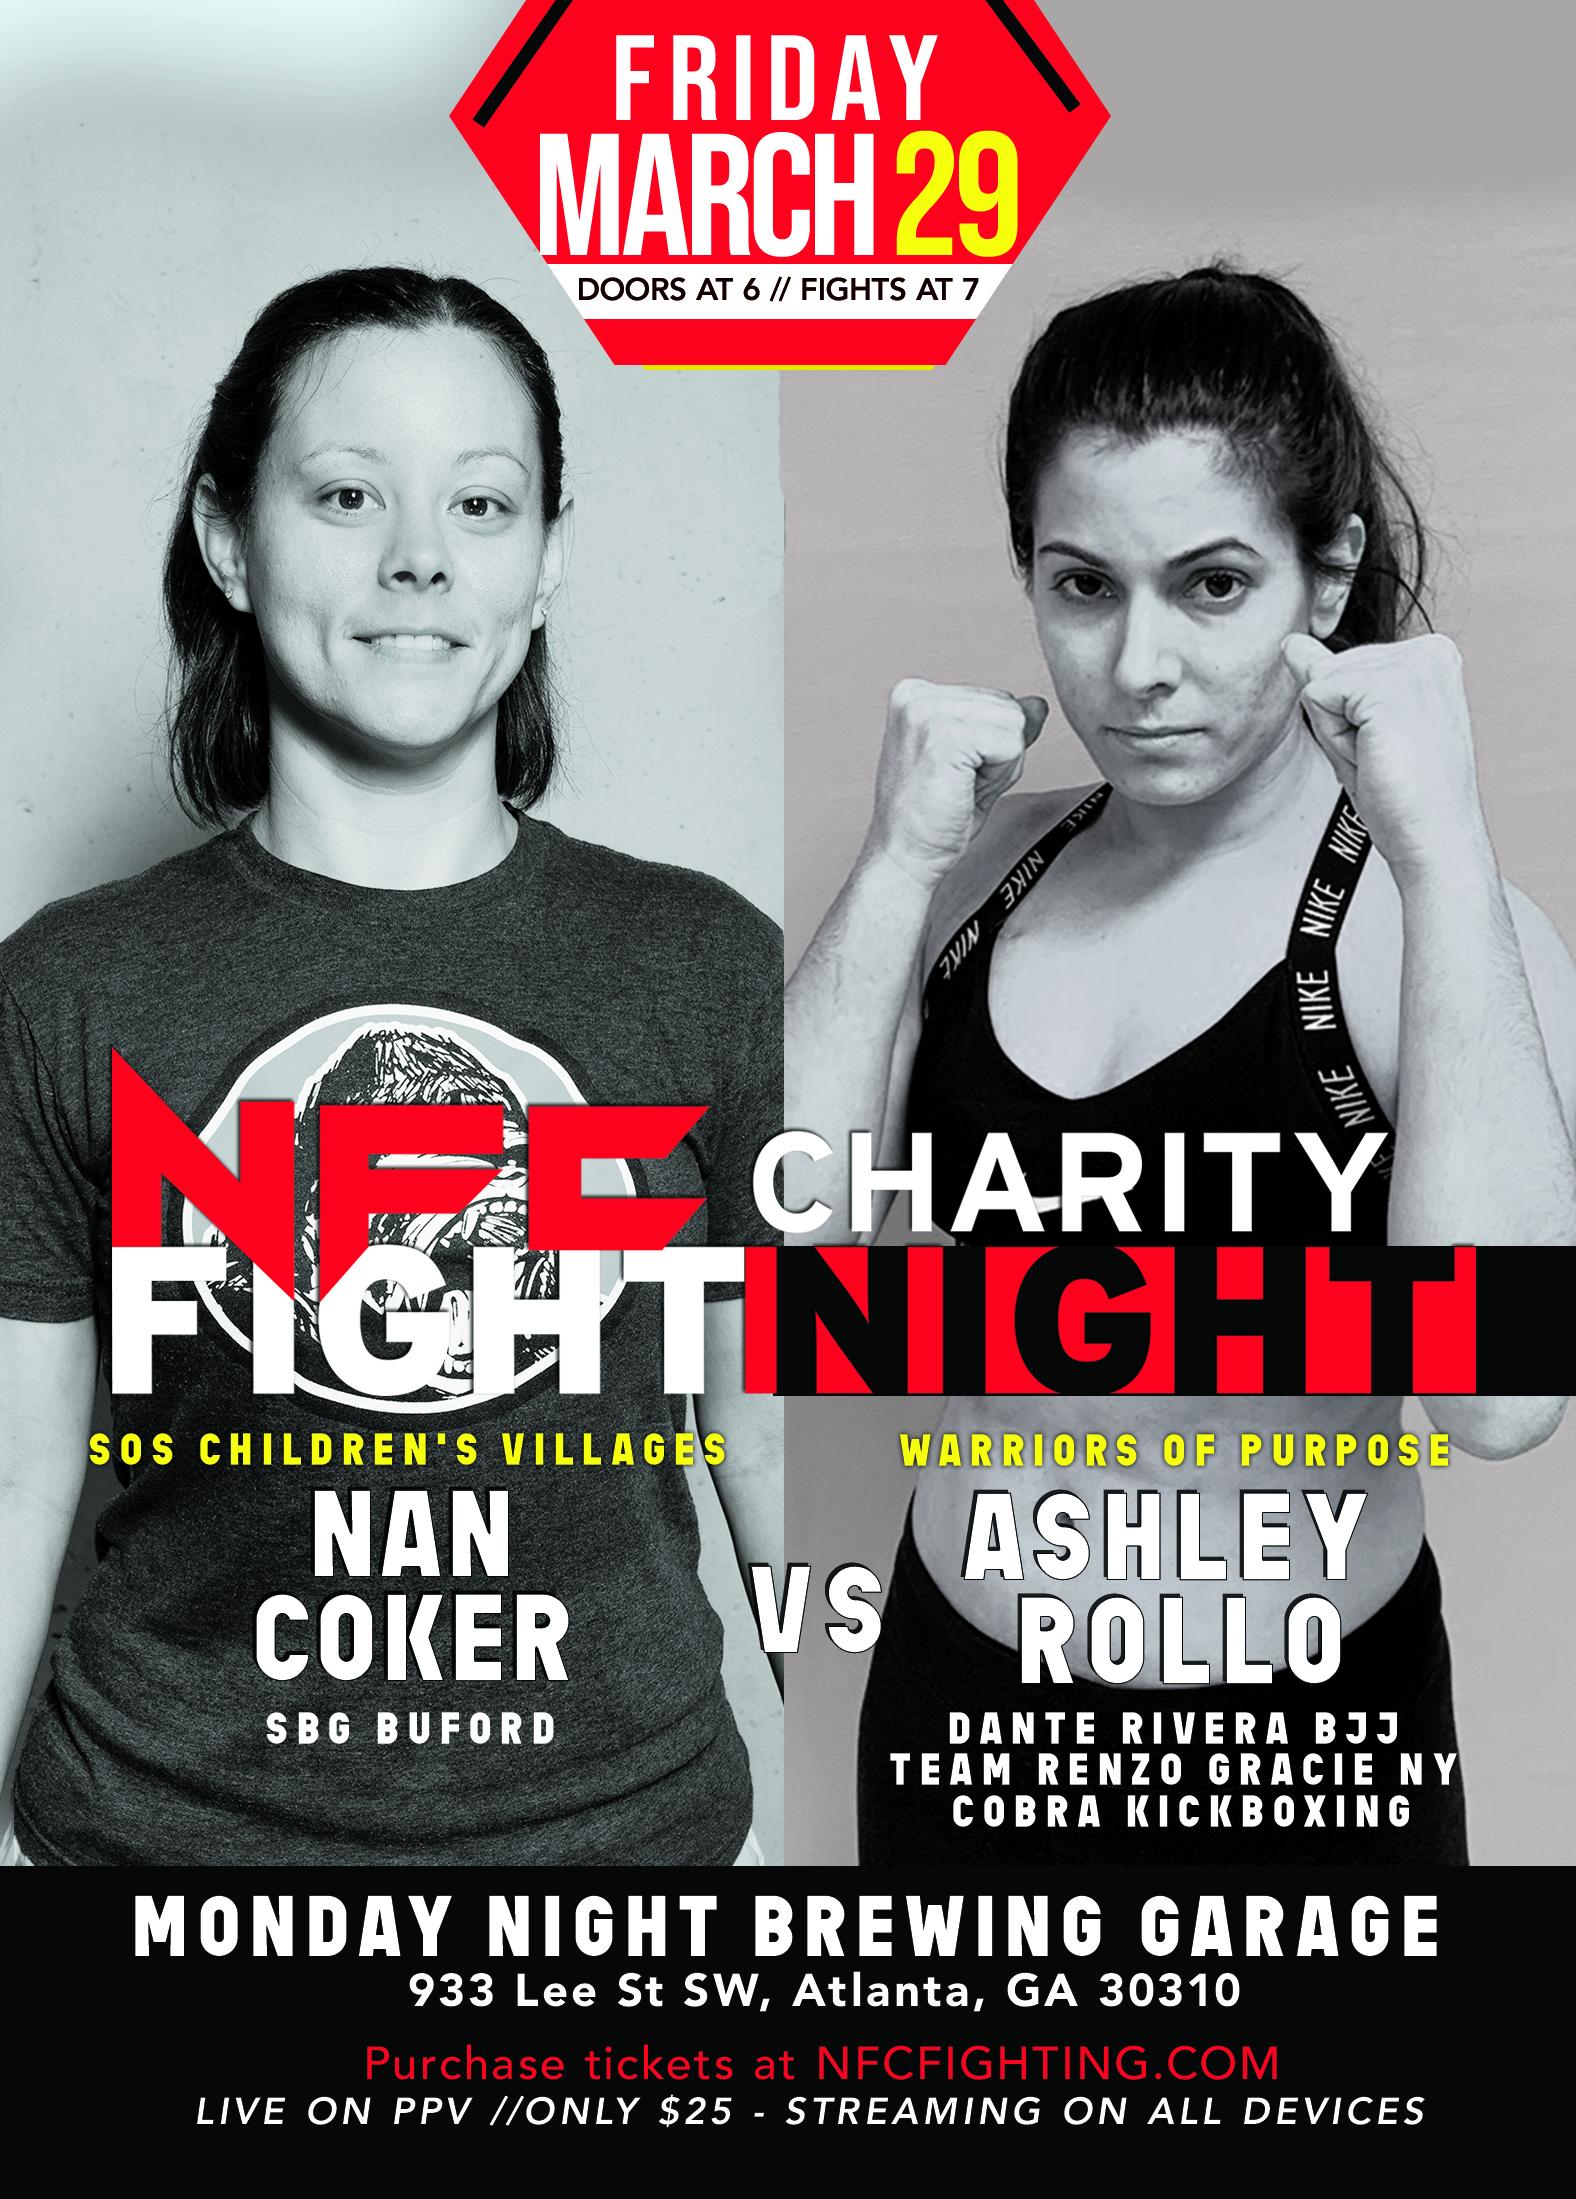 FightNightCharity_CokerRollo.jpg